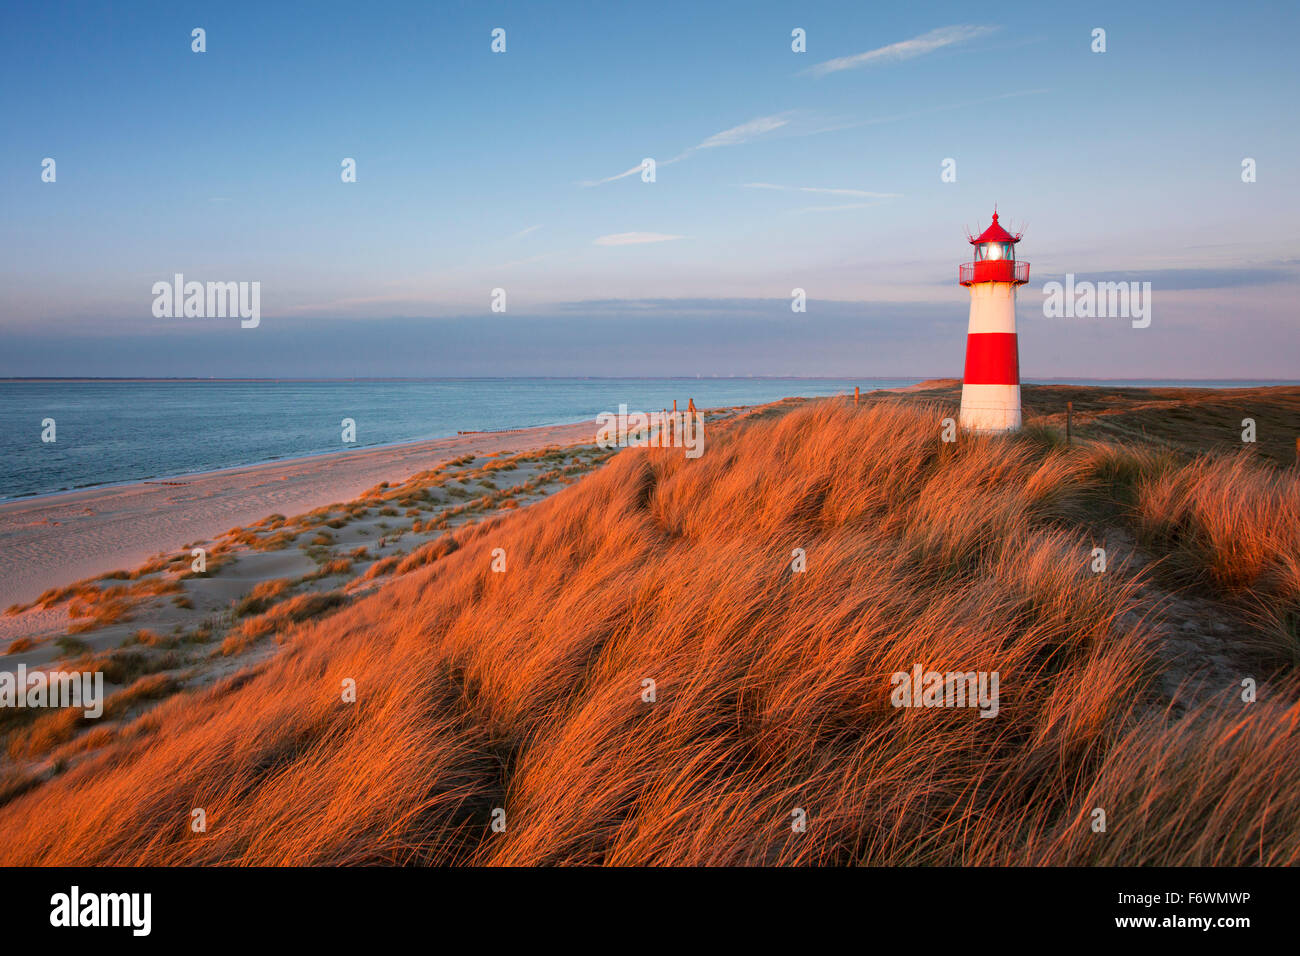 List Ost lighthouse, Ellenbogen peninsula, Sylt island, North Sea, North Friesland, Schleswig-Holstein, Germany - Stock Image